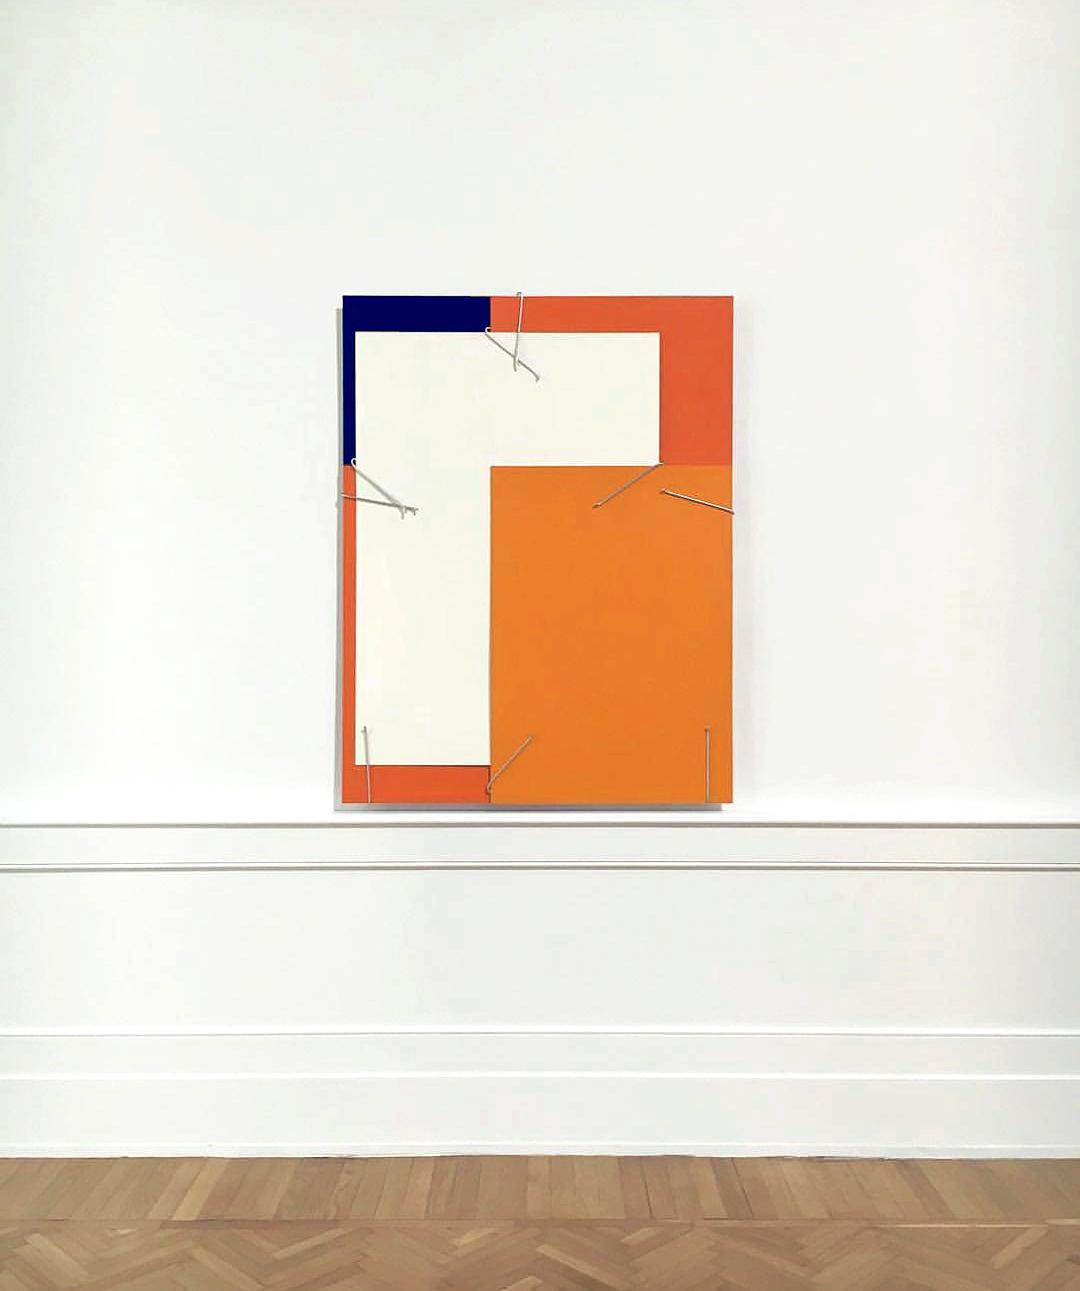 Antonio Catelani - Antonio-Catelani-1996 Galleria Nazionale d'Arte Moderna Roma